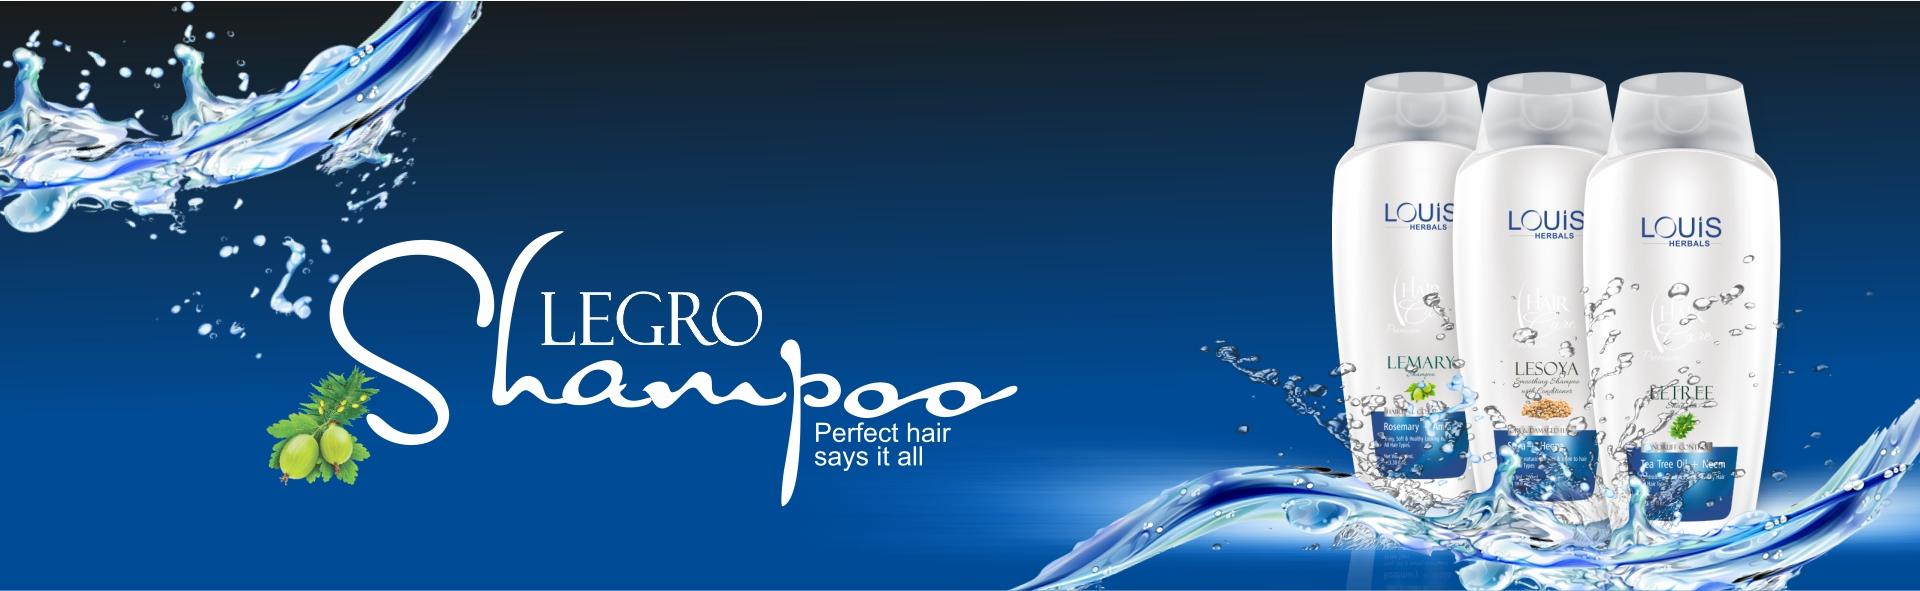 legro-shampoo